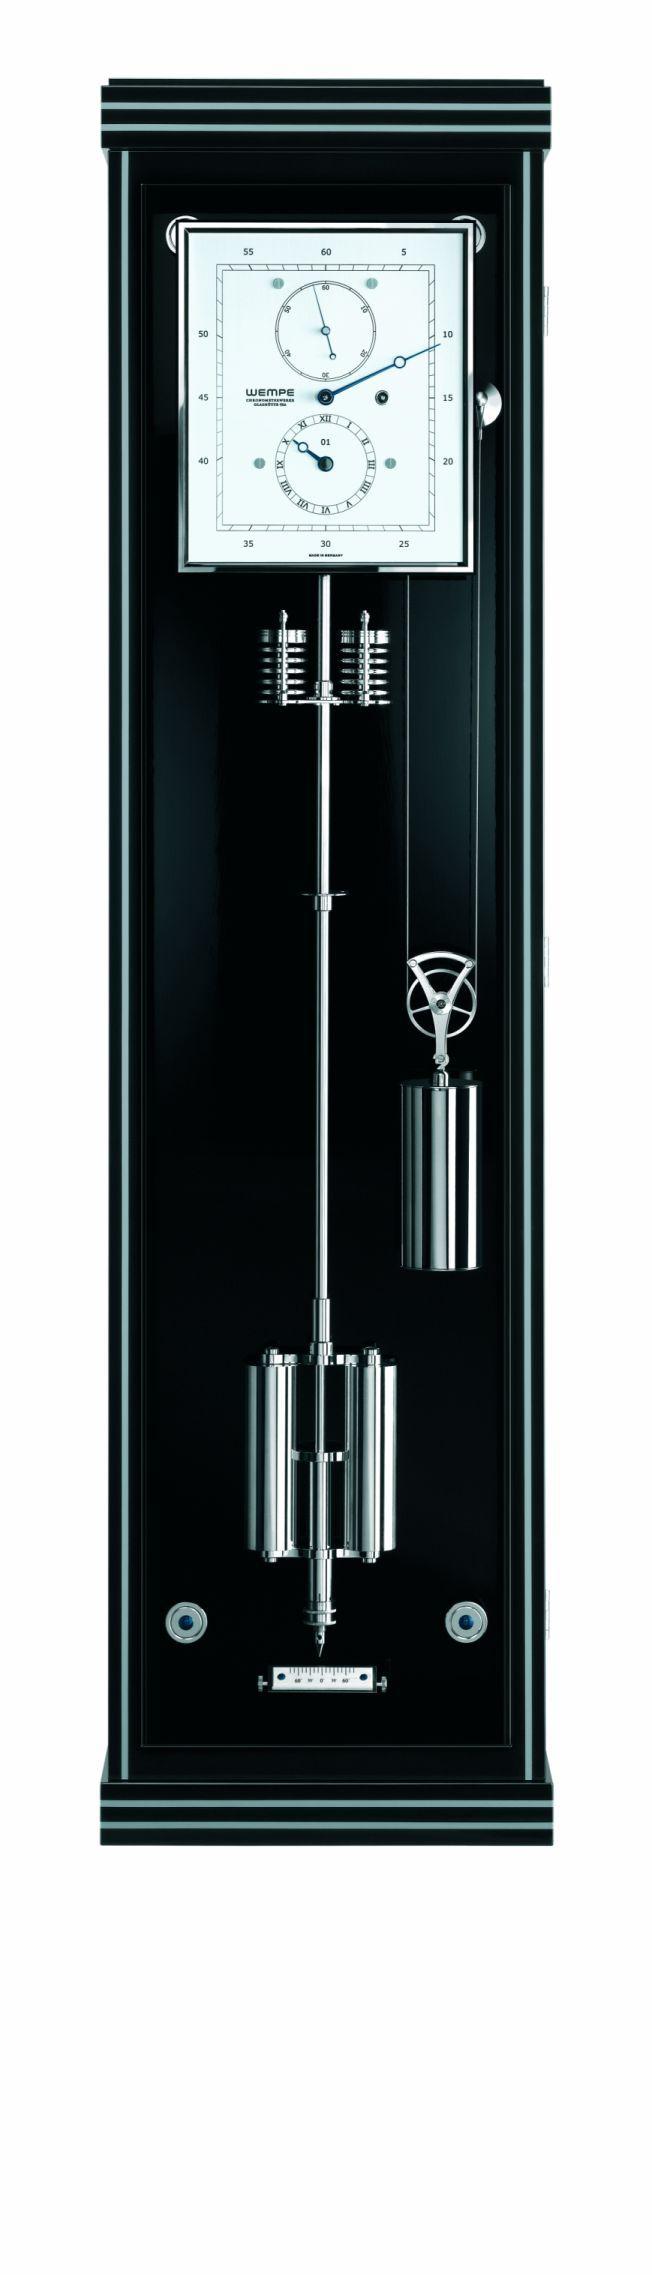 TimeZone : Industry News » N E W M o d e l - Wempe Glashütte i/SA: Chronometerwerke Precision Pendulum Clock